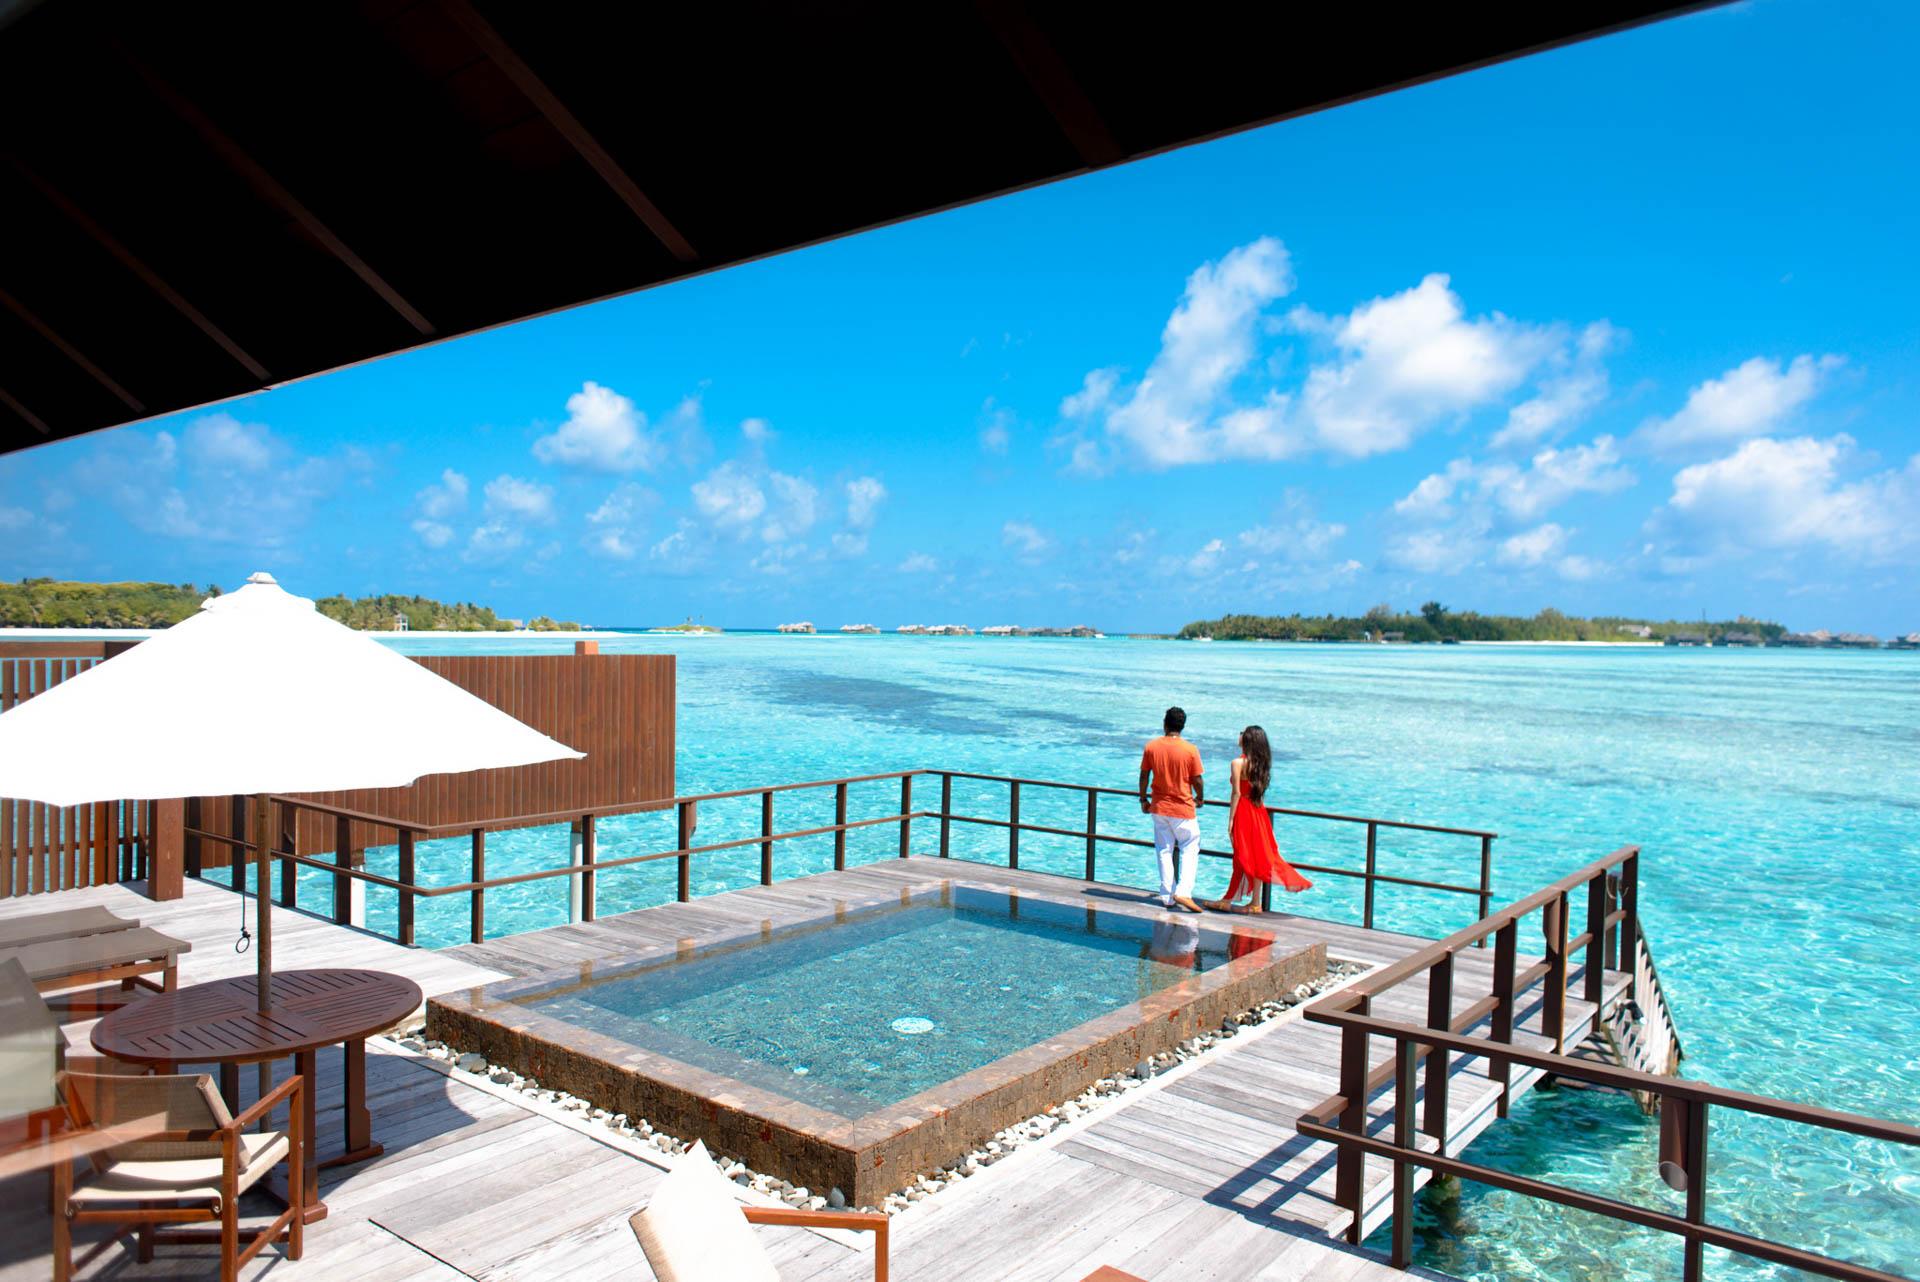 Abhijit Meghna Romantic Vacation in Maldives 12